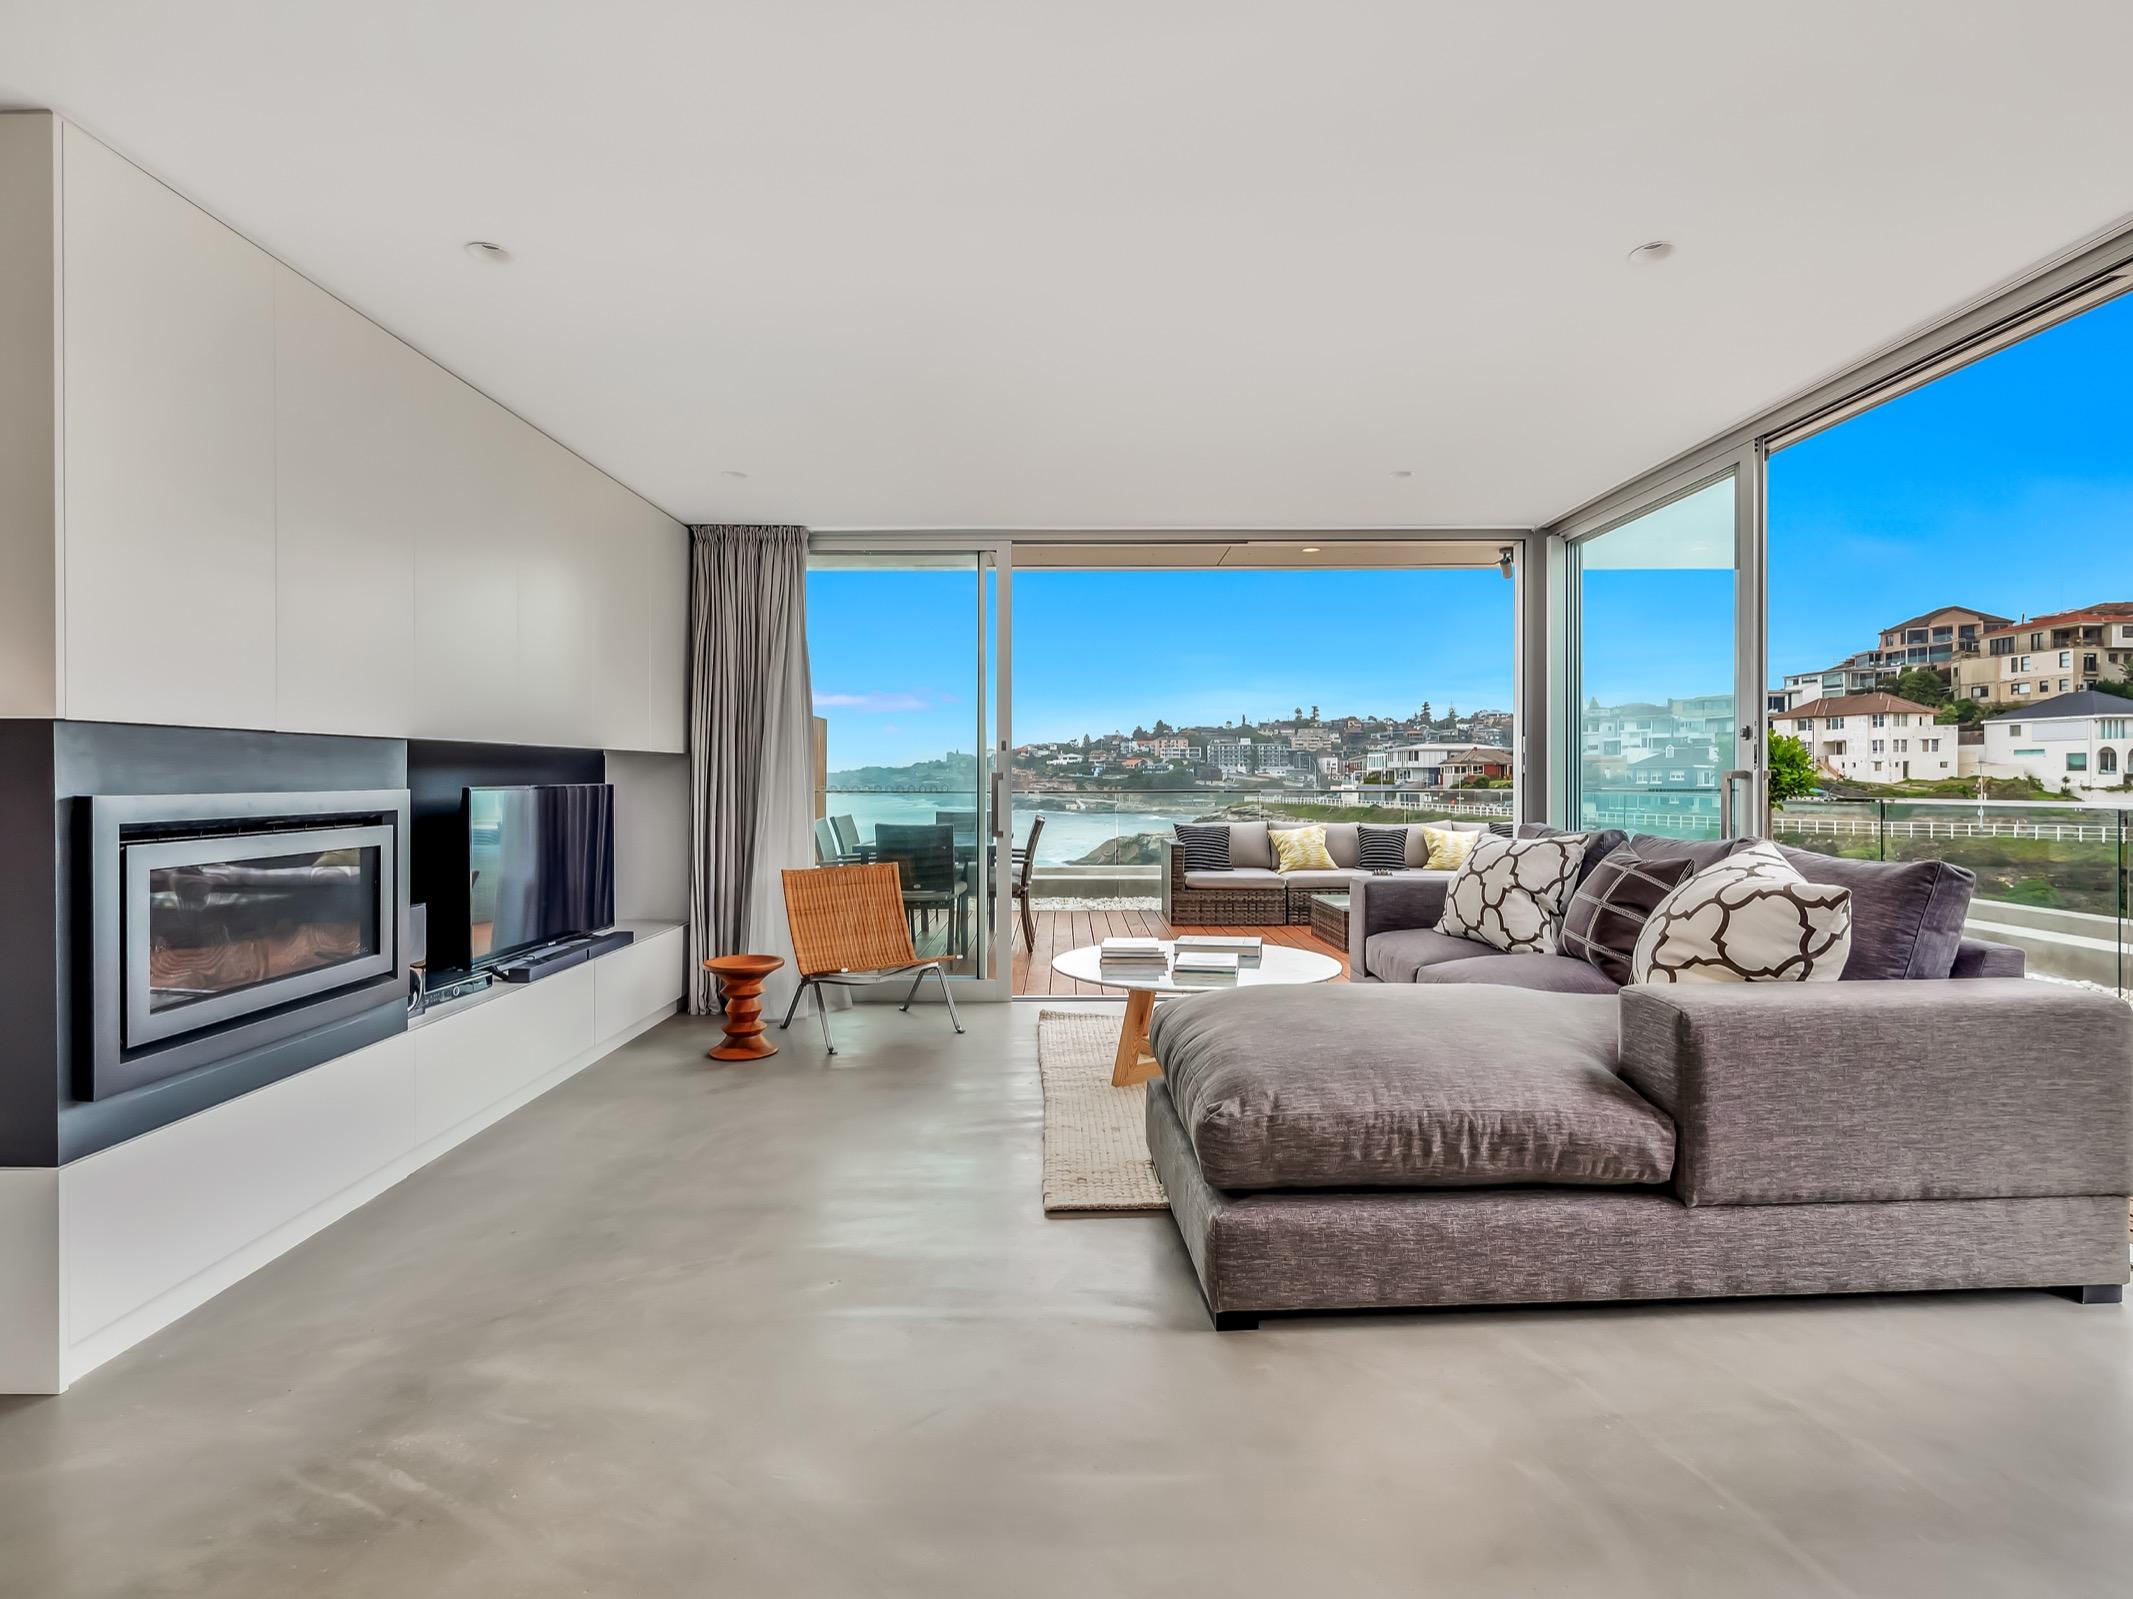 Beachfrotnt Penthouse Tamarama. Bondi Beach Holiday Homes6.jpg